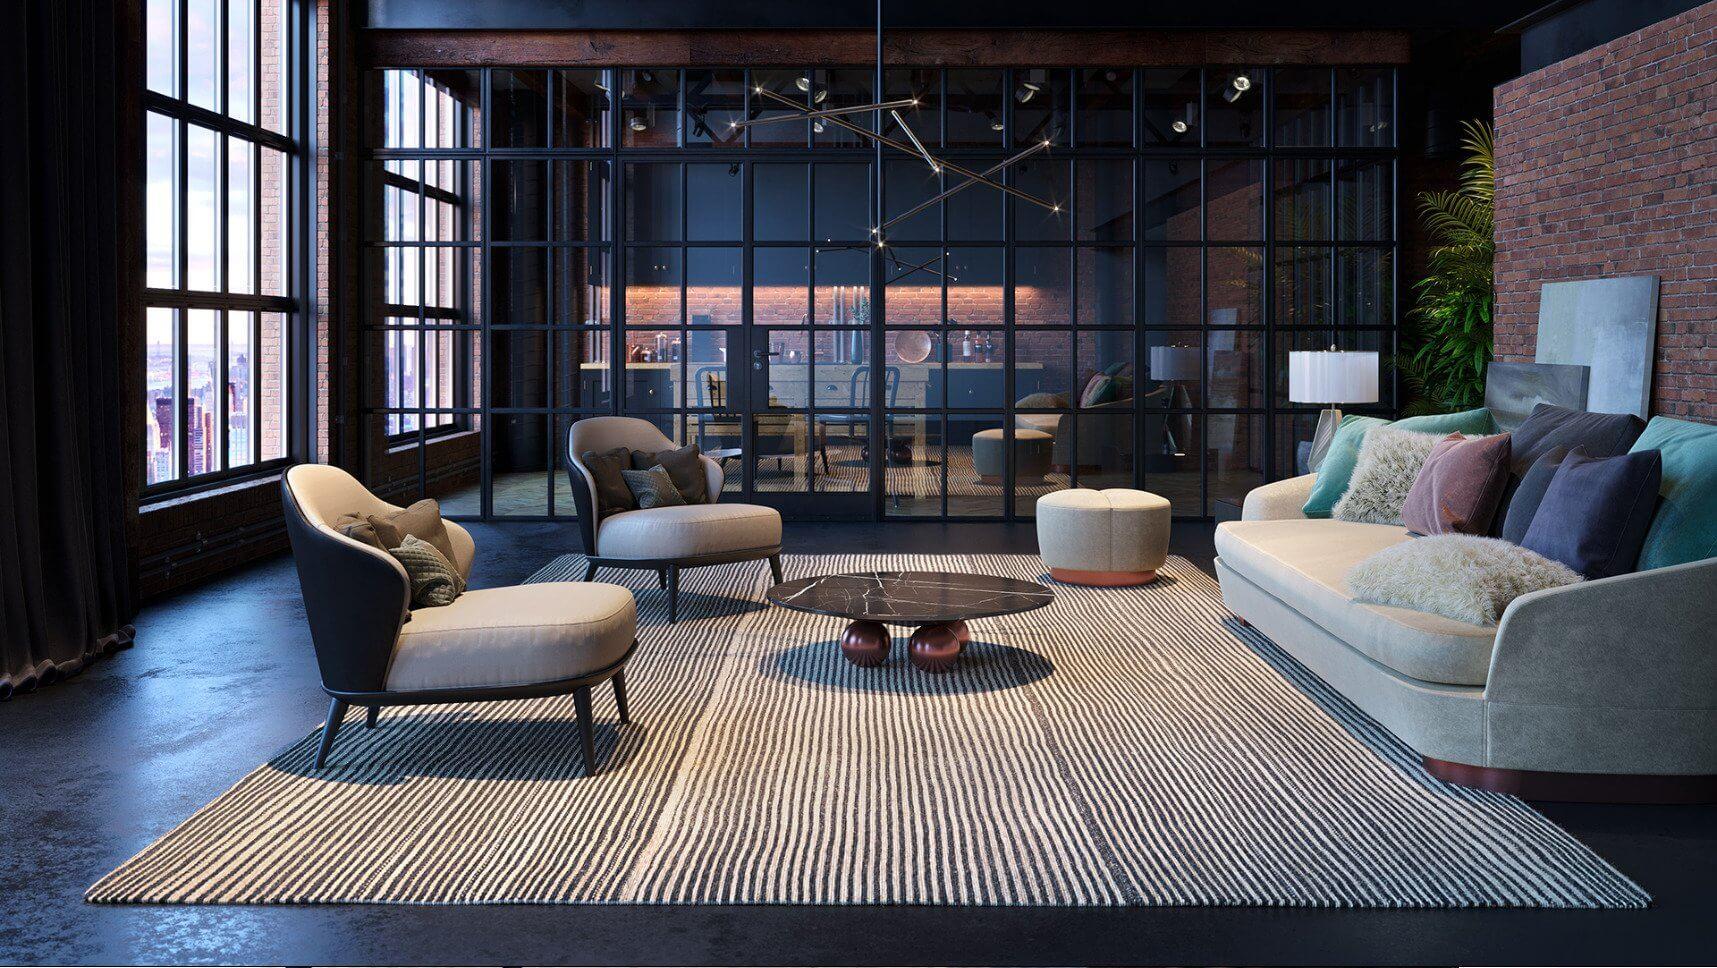 Lovely Living room interior design inspiration - cgi visualization 3